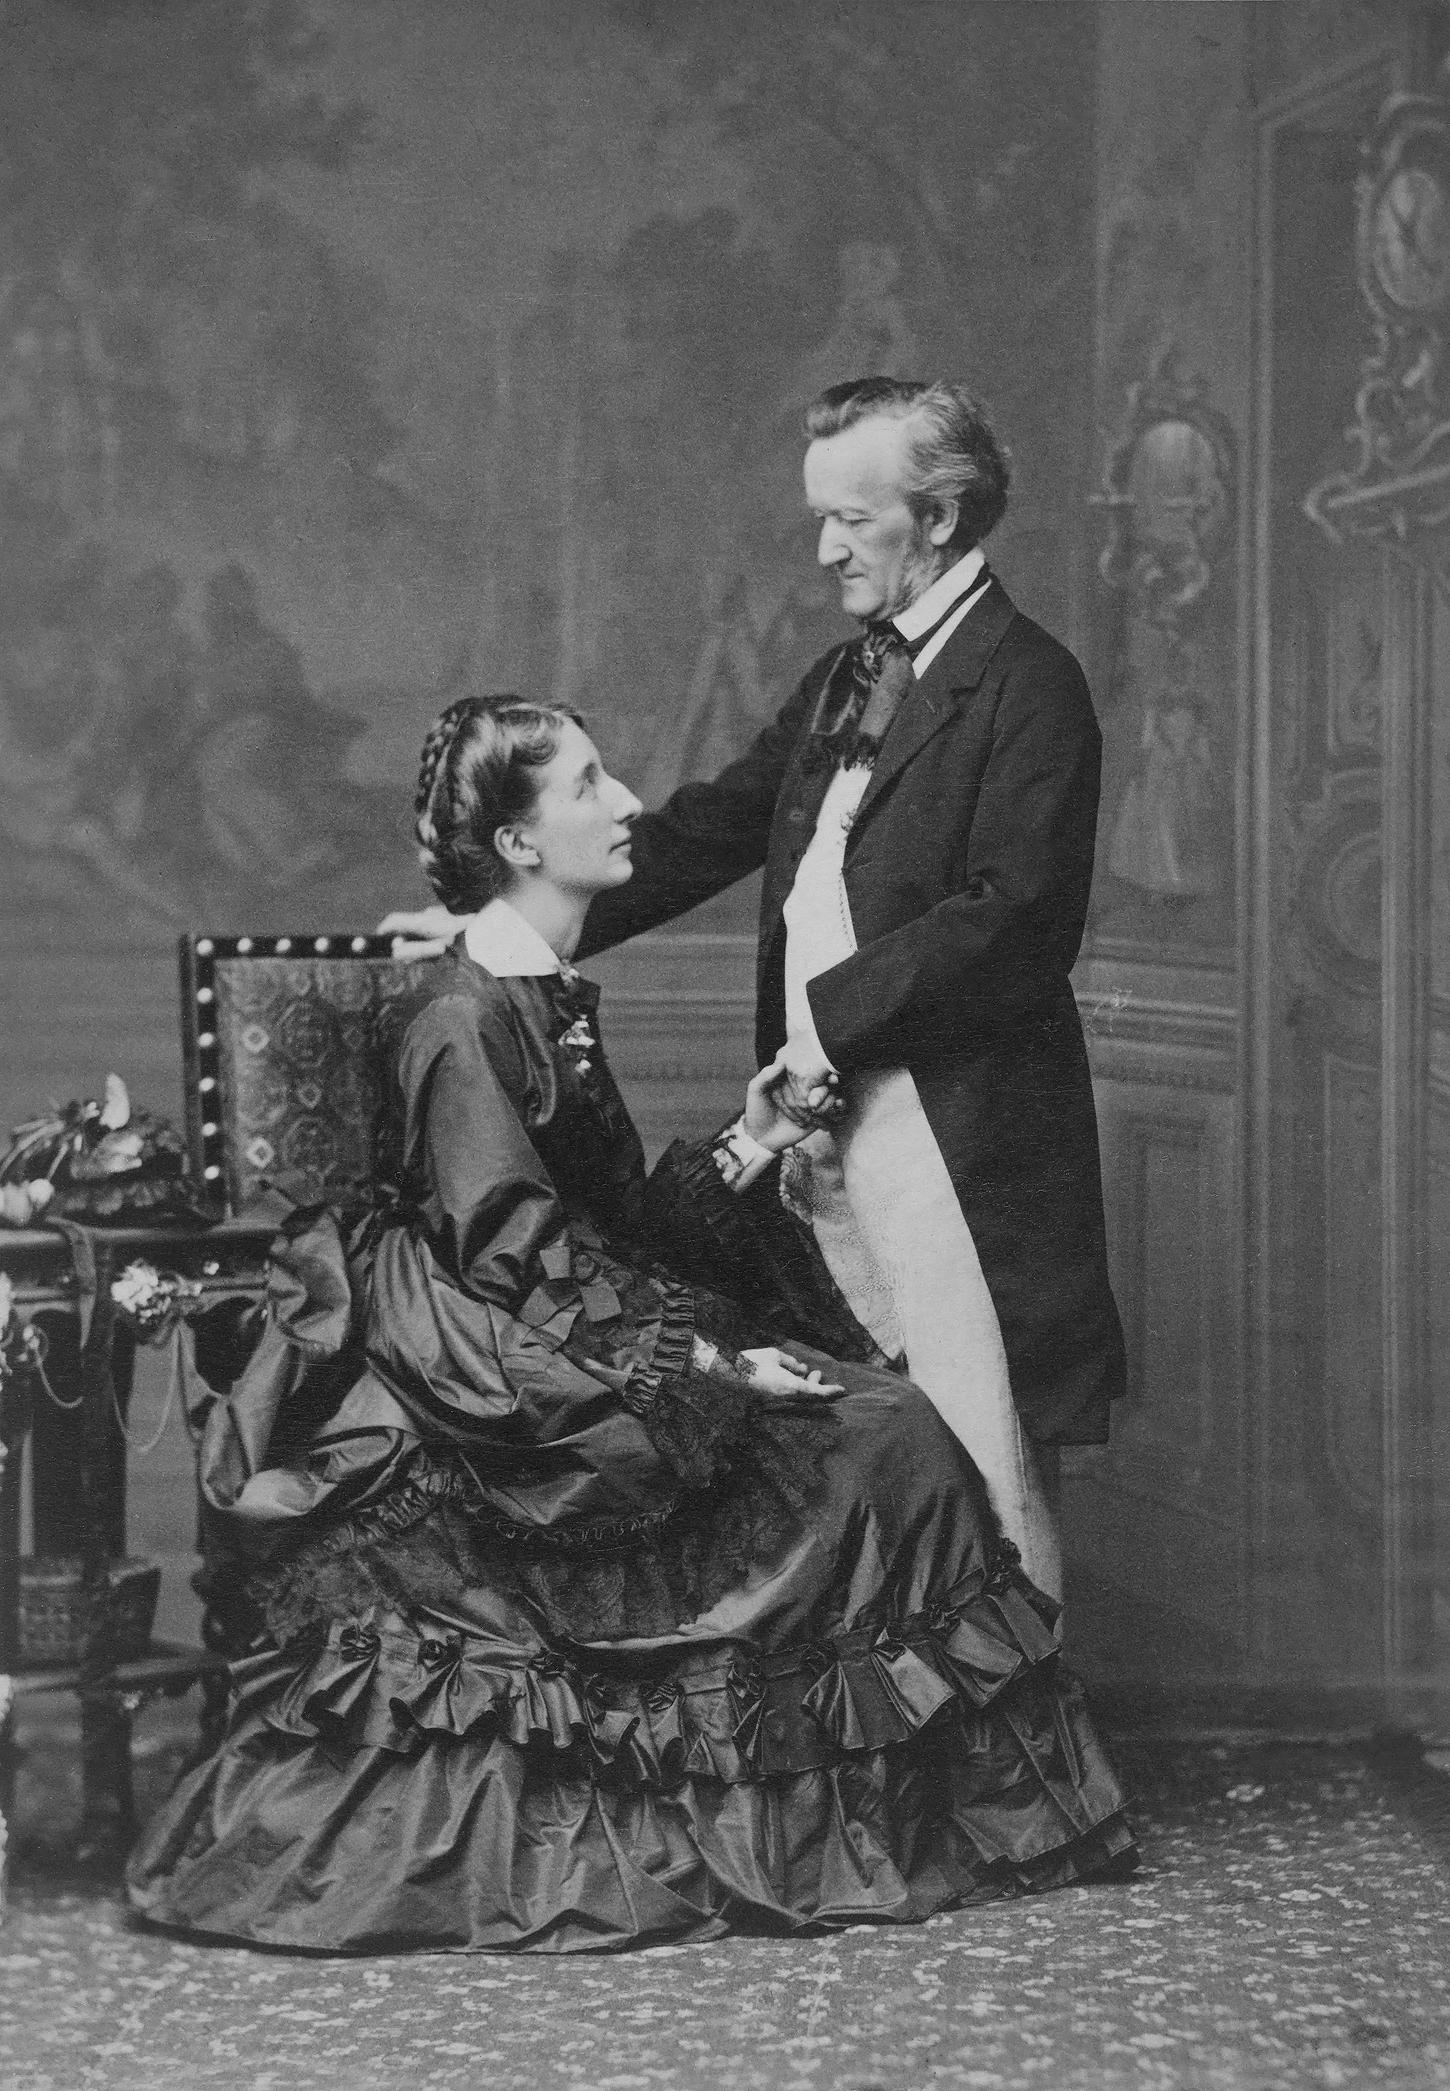 Fritz_Luckhardt_-_Richard_y_Cosima_Wagner_(9_de_mayo_de_1872,_Viena).jpg